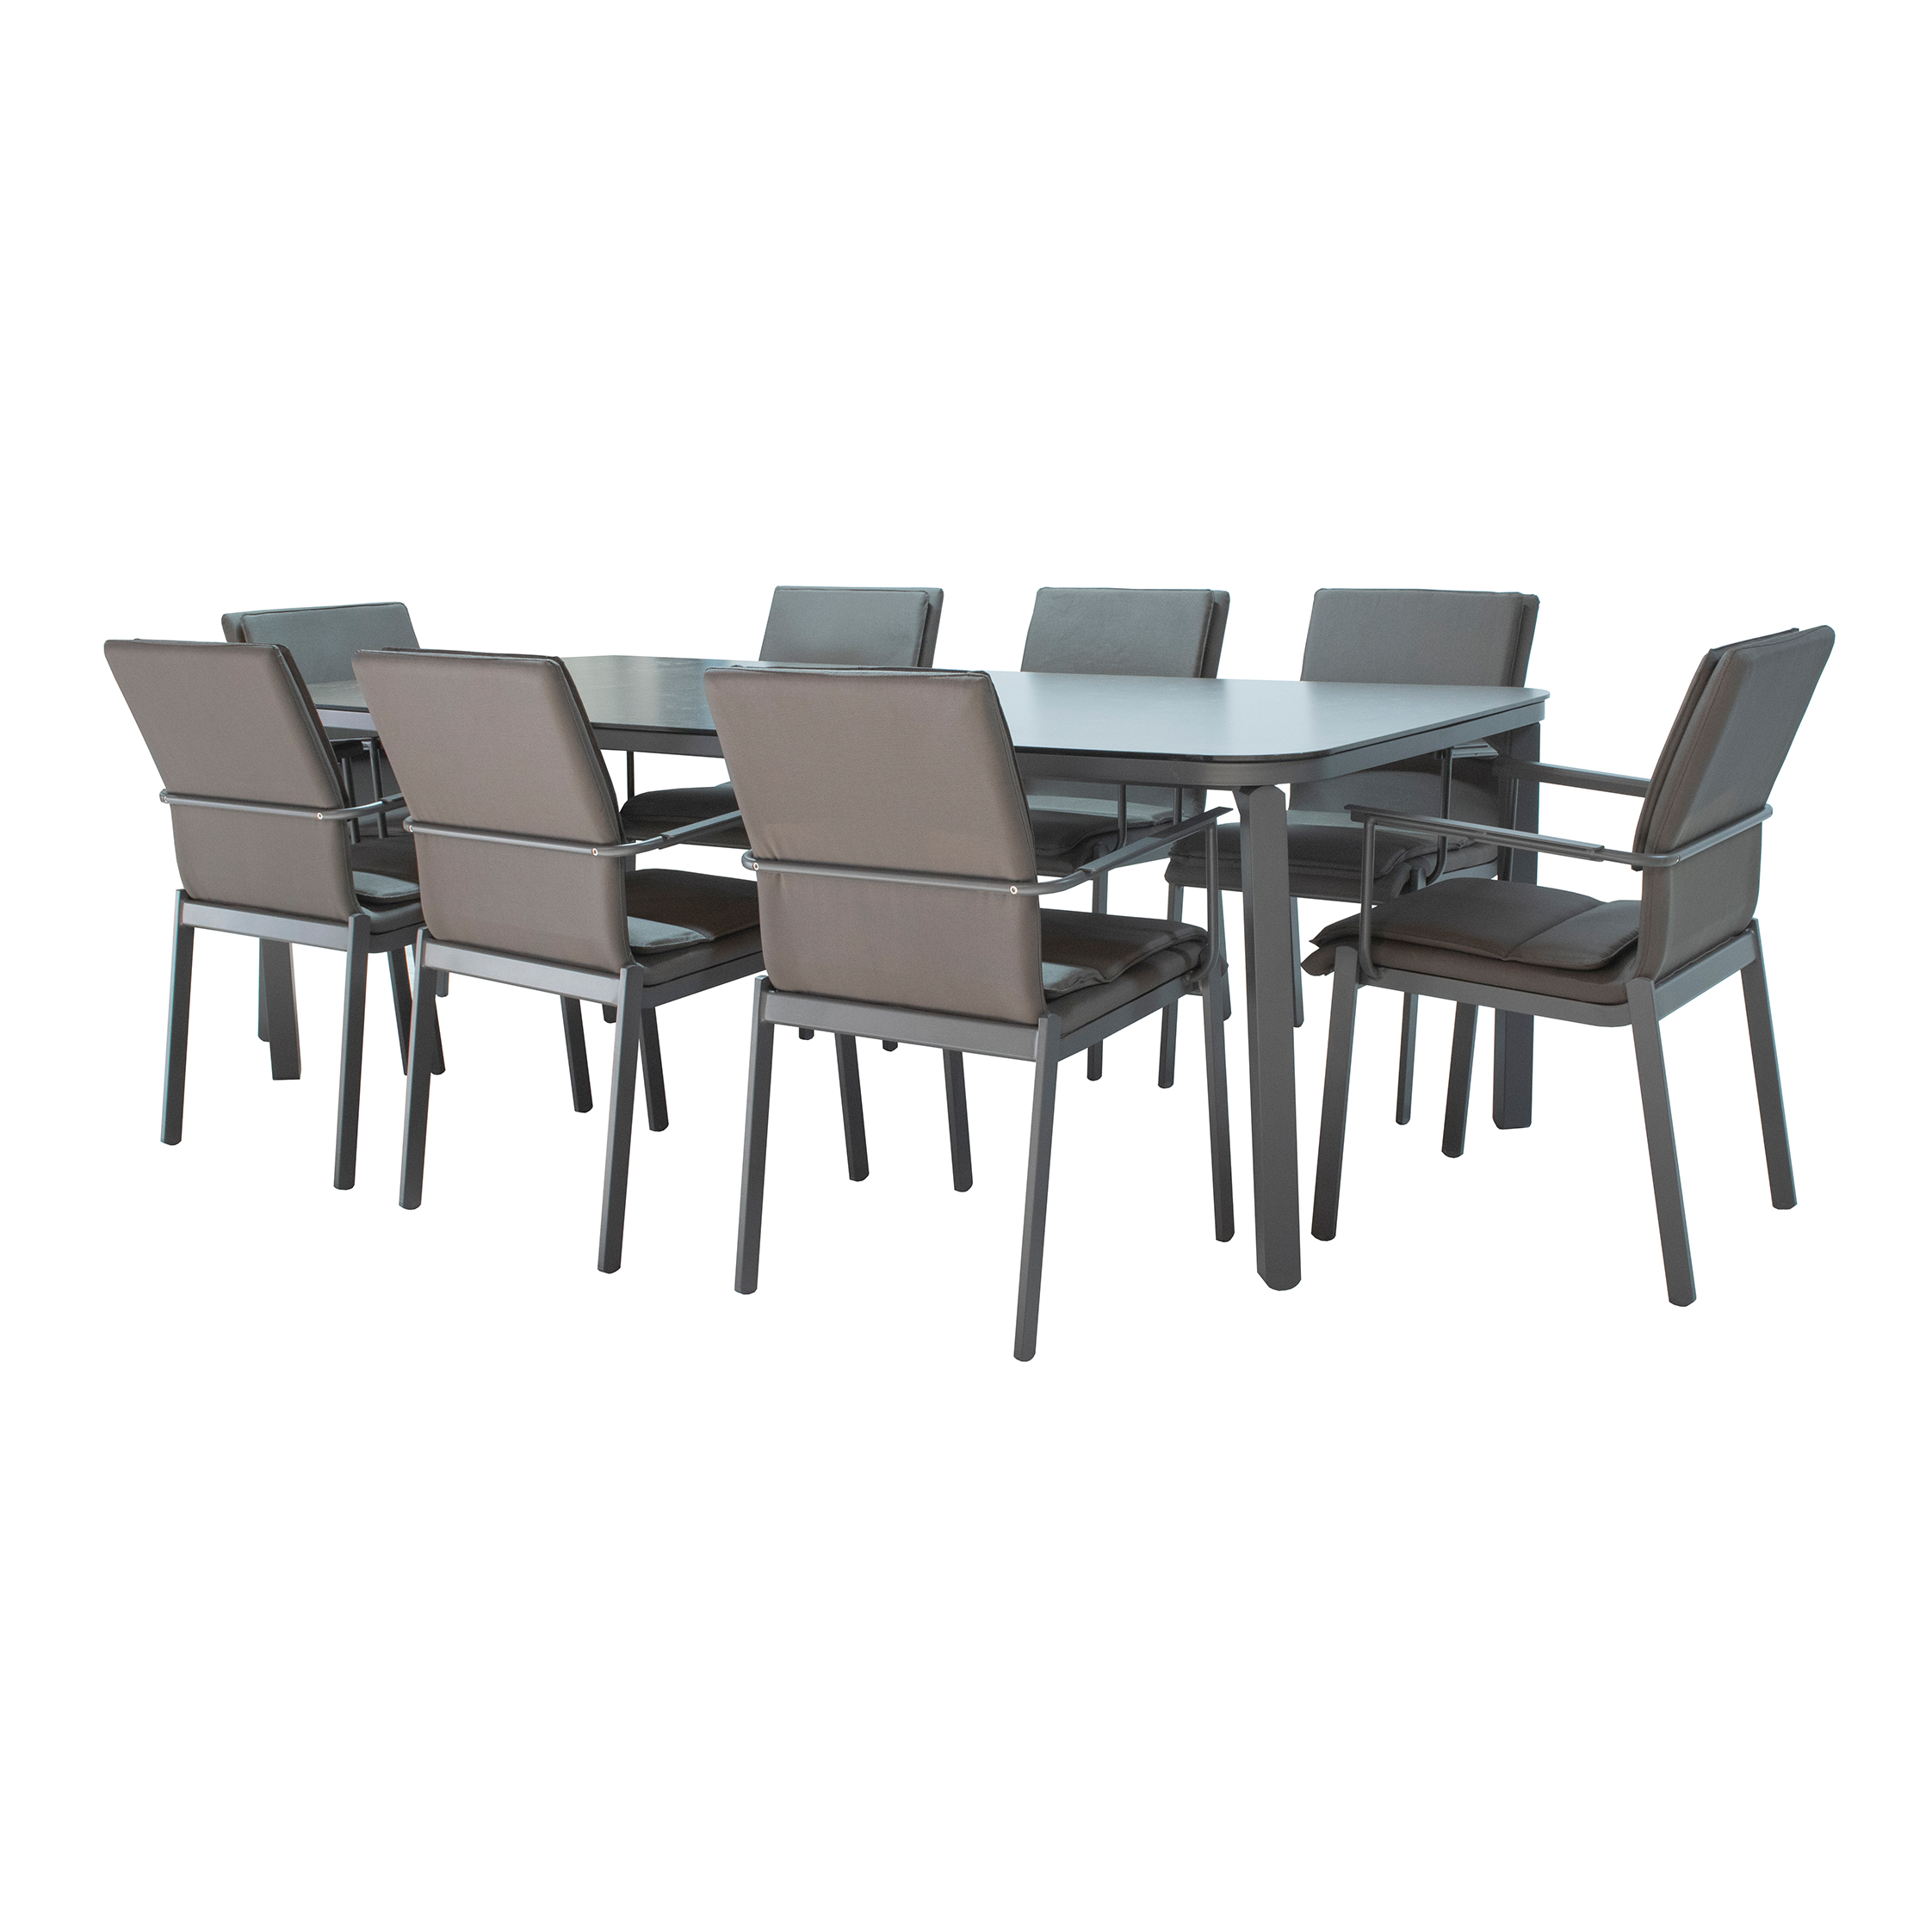 Cora 8 seater Dining set